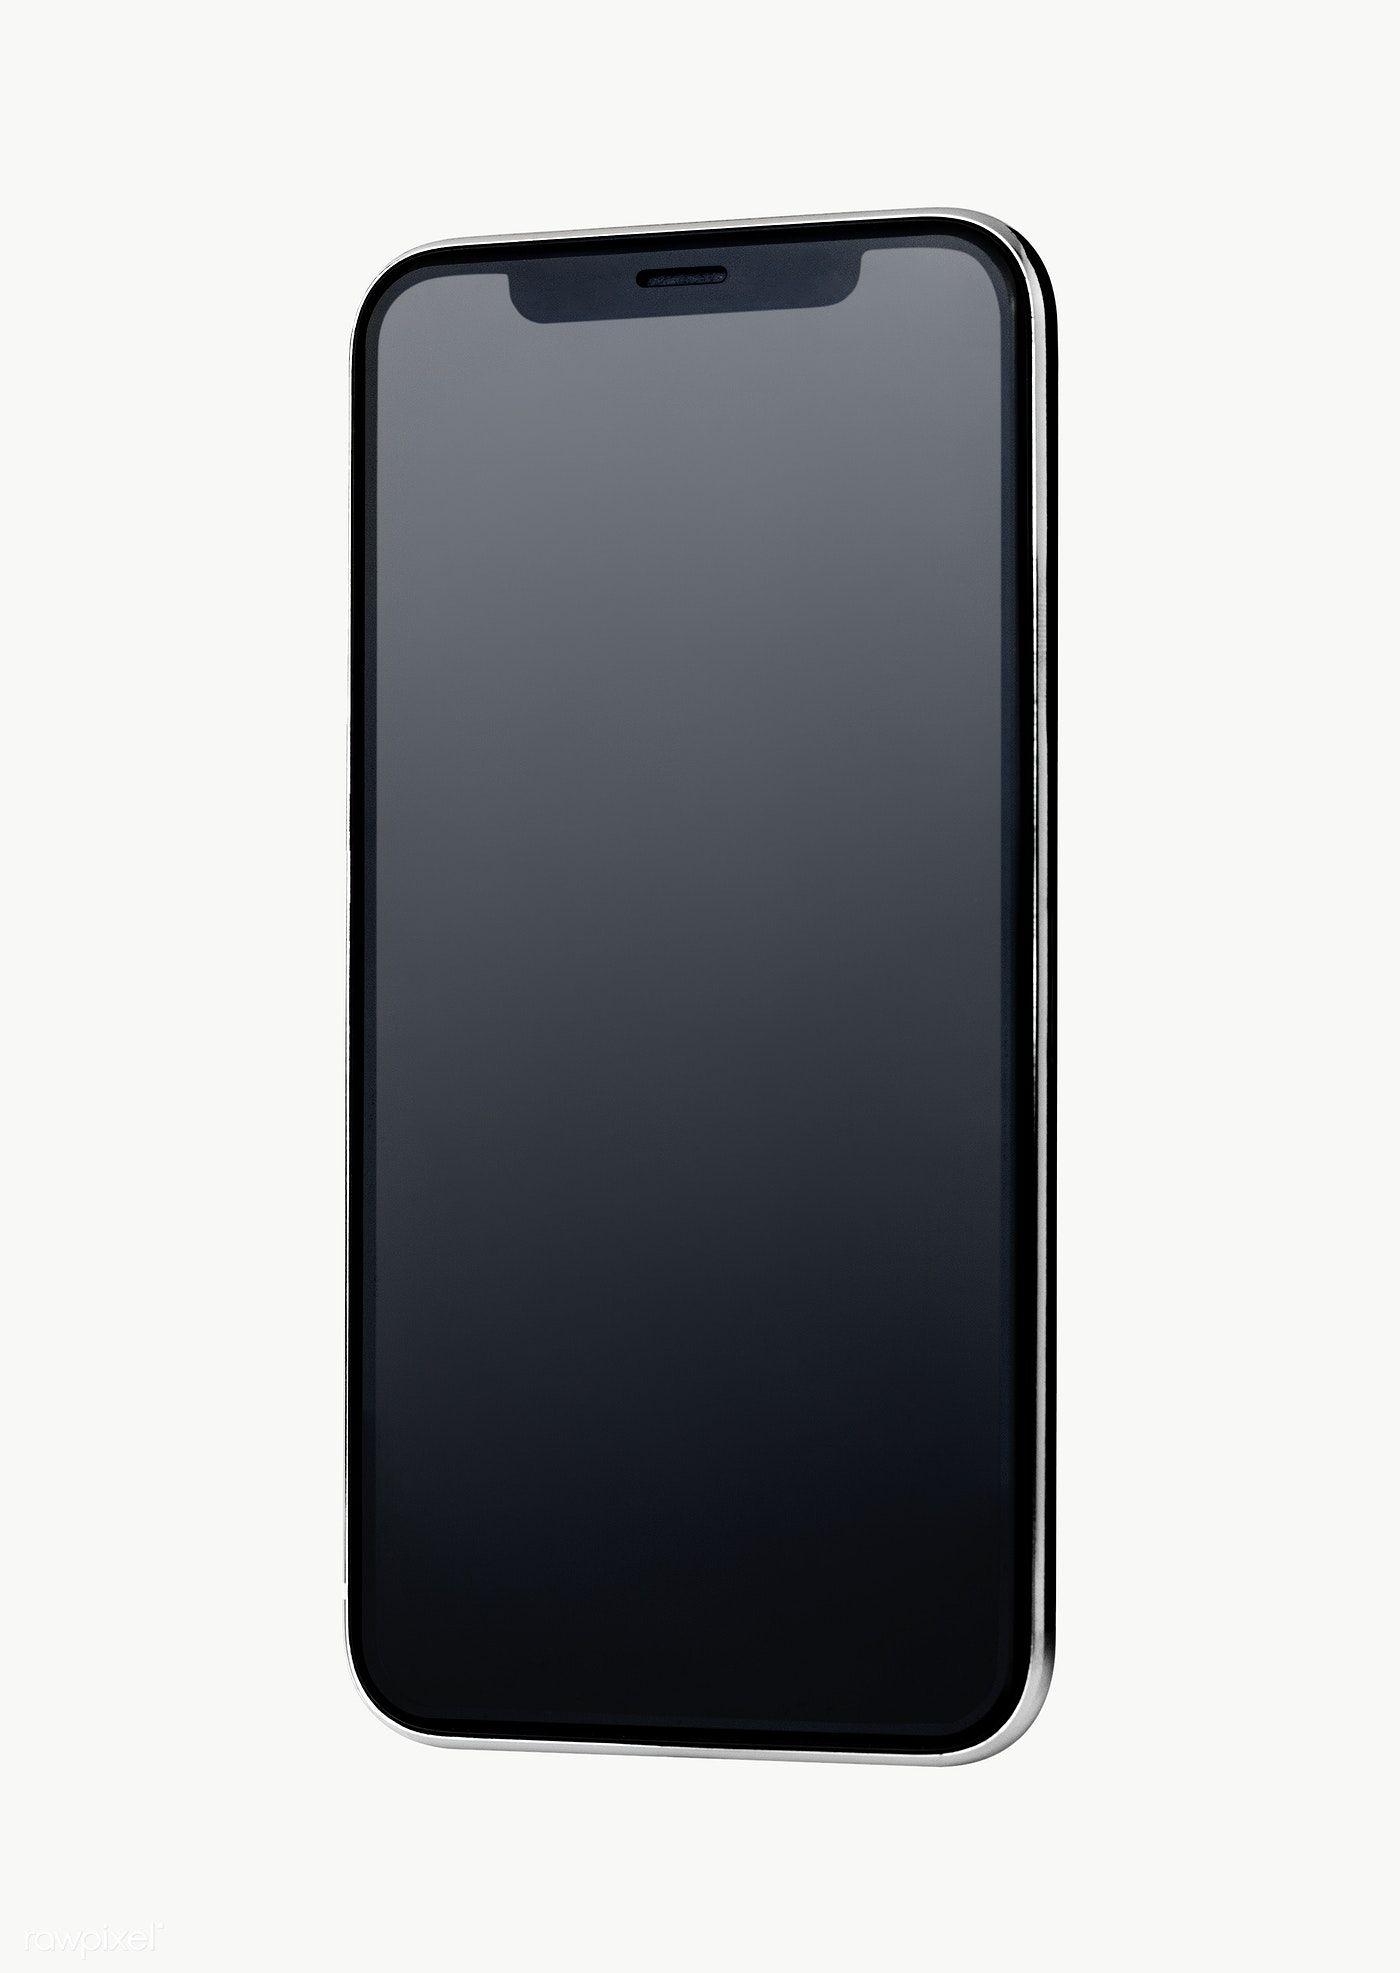 Black Cellphone Screen Mockup Transparent Png Premium Image By Rawpixel Com Eyeeyeview Phone Template Mockup Design Smartphone Art